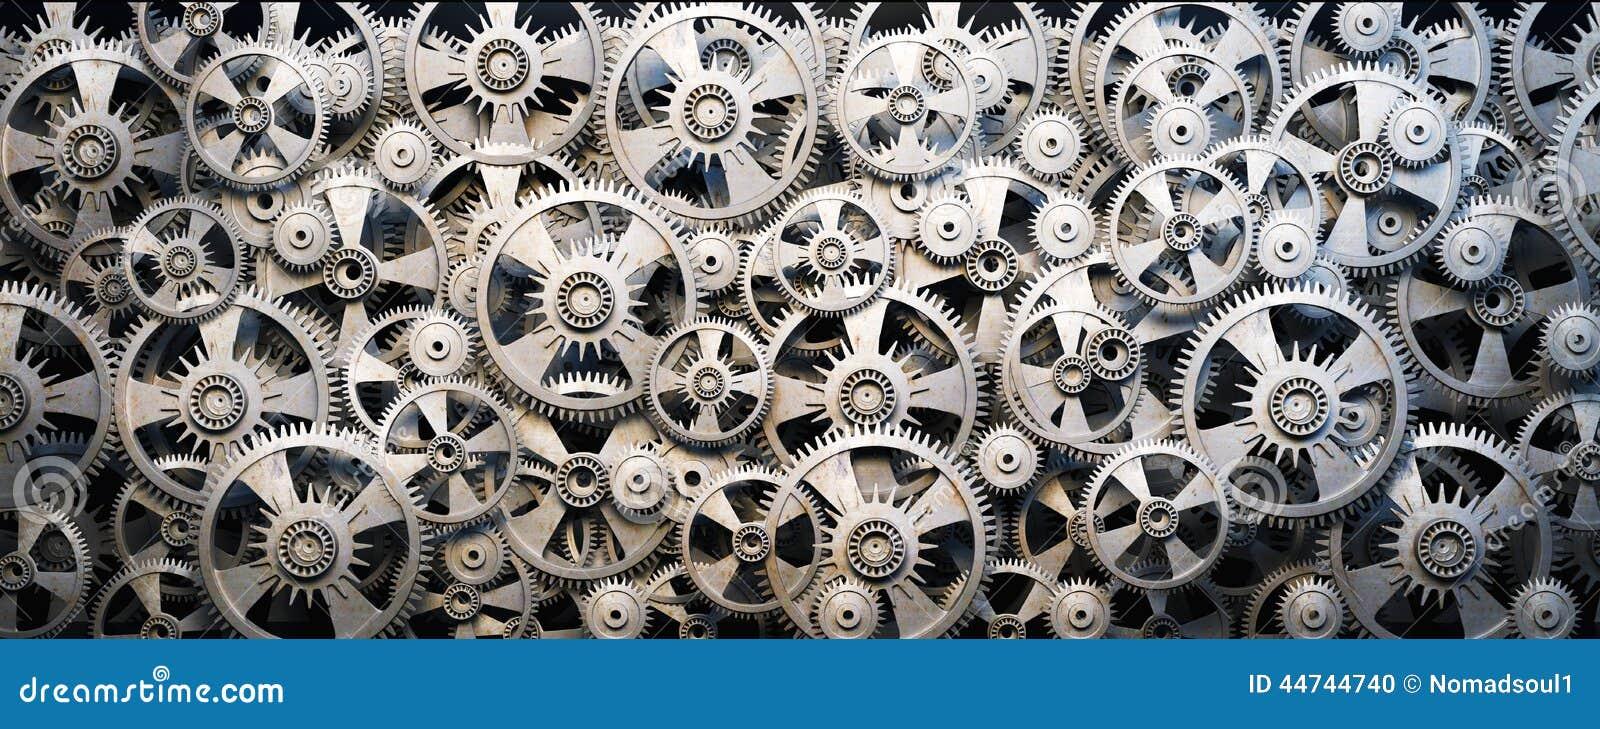 Gears And Cogwheels Stock Illustration - Image: 44744740